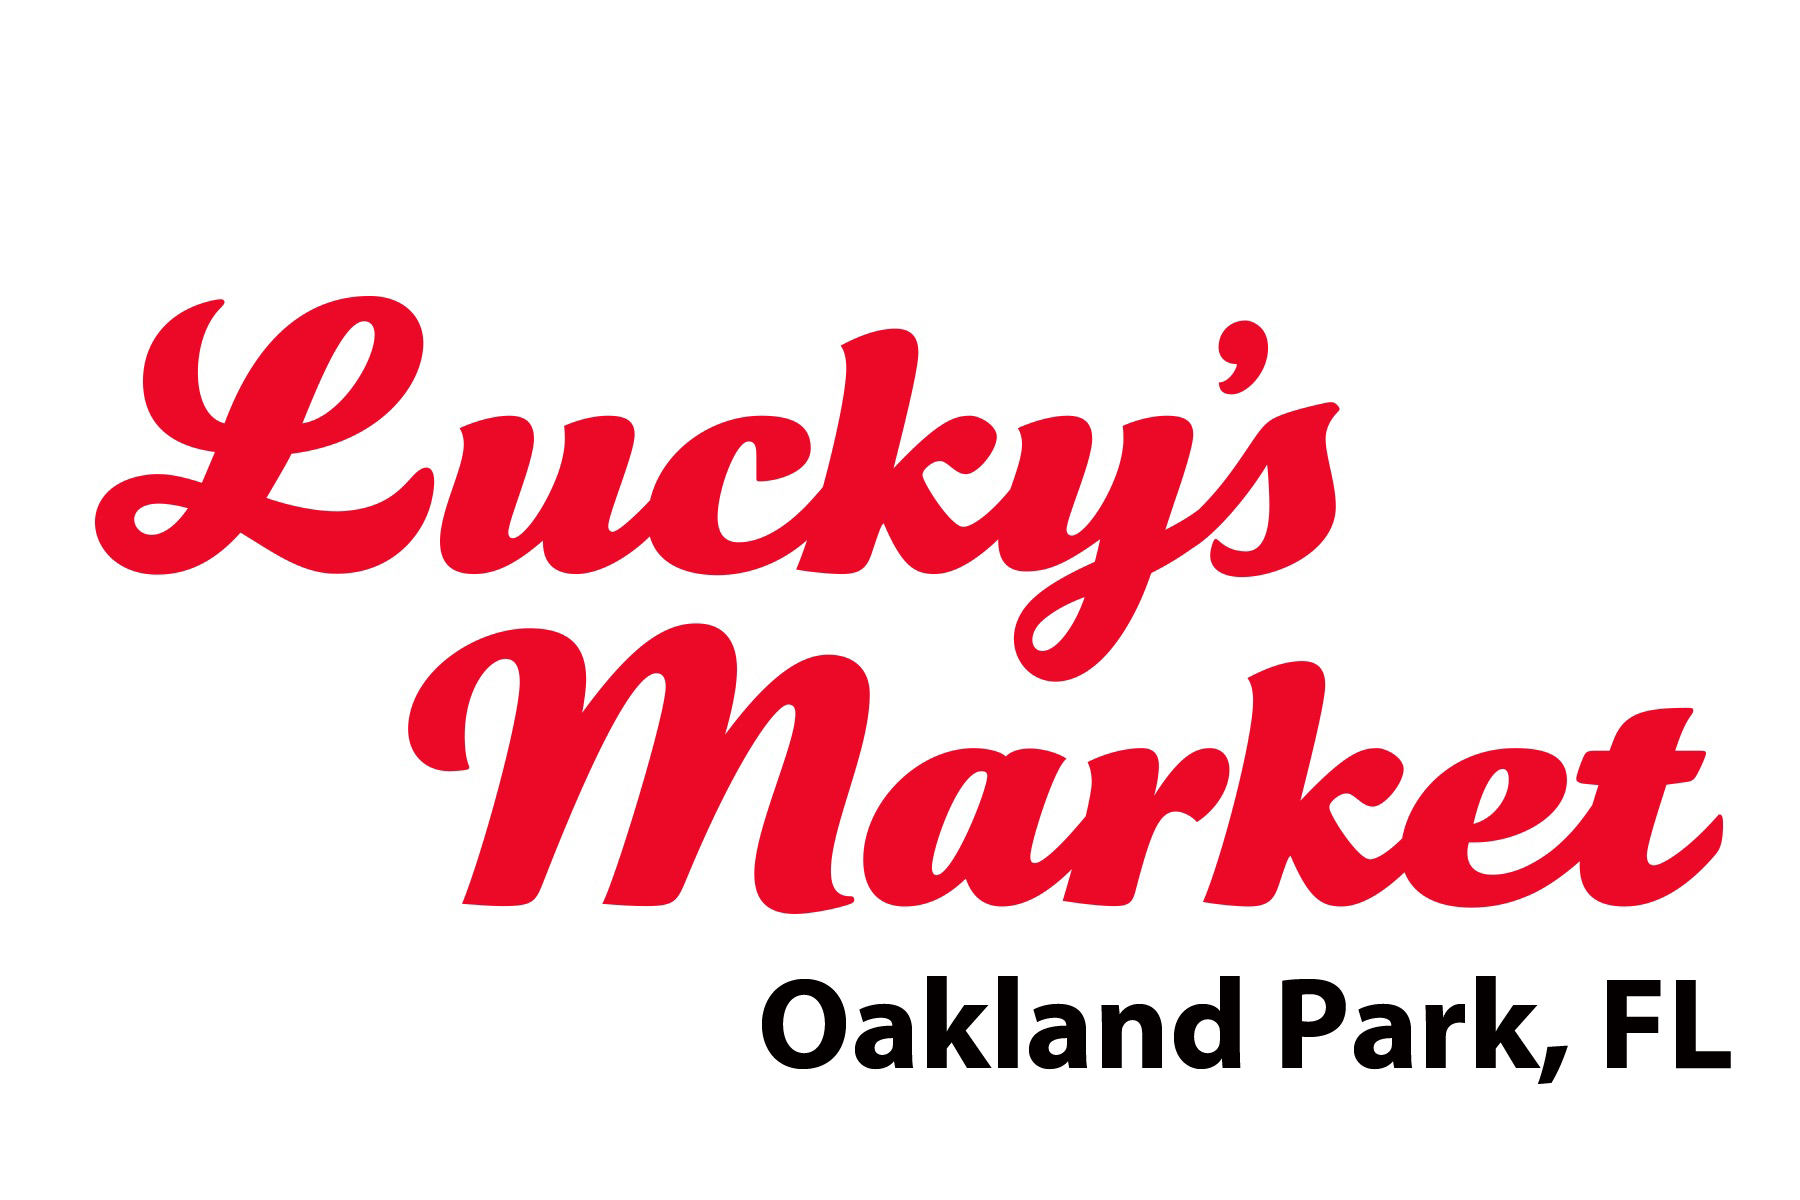 Oakland Park, FL - Lucky's Market